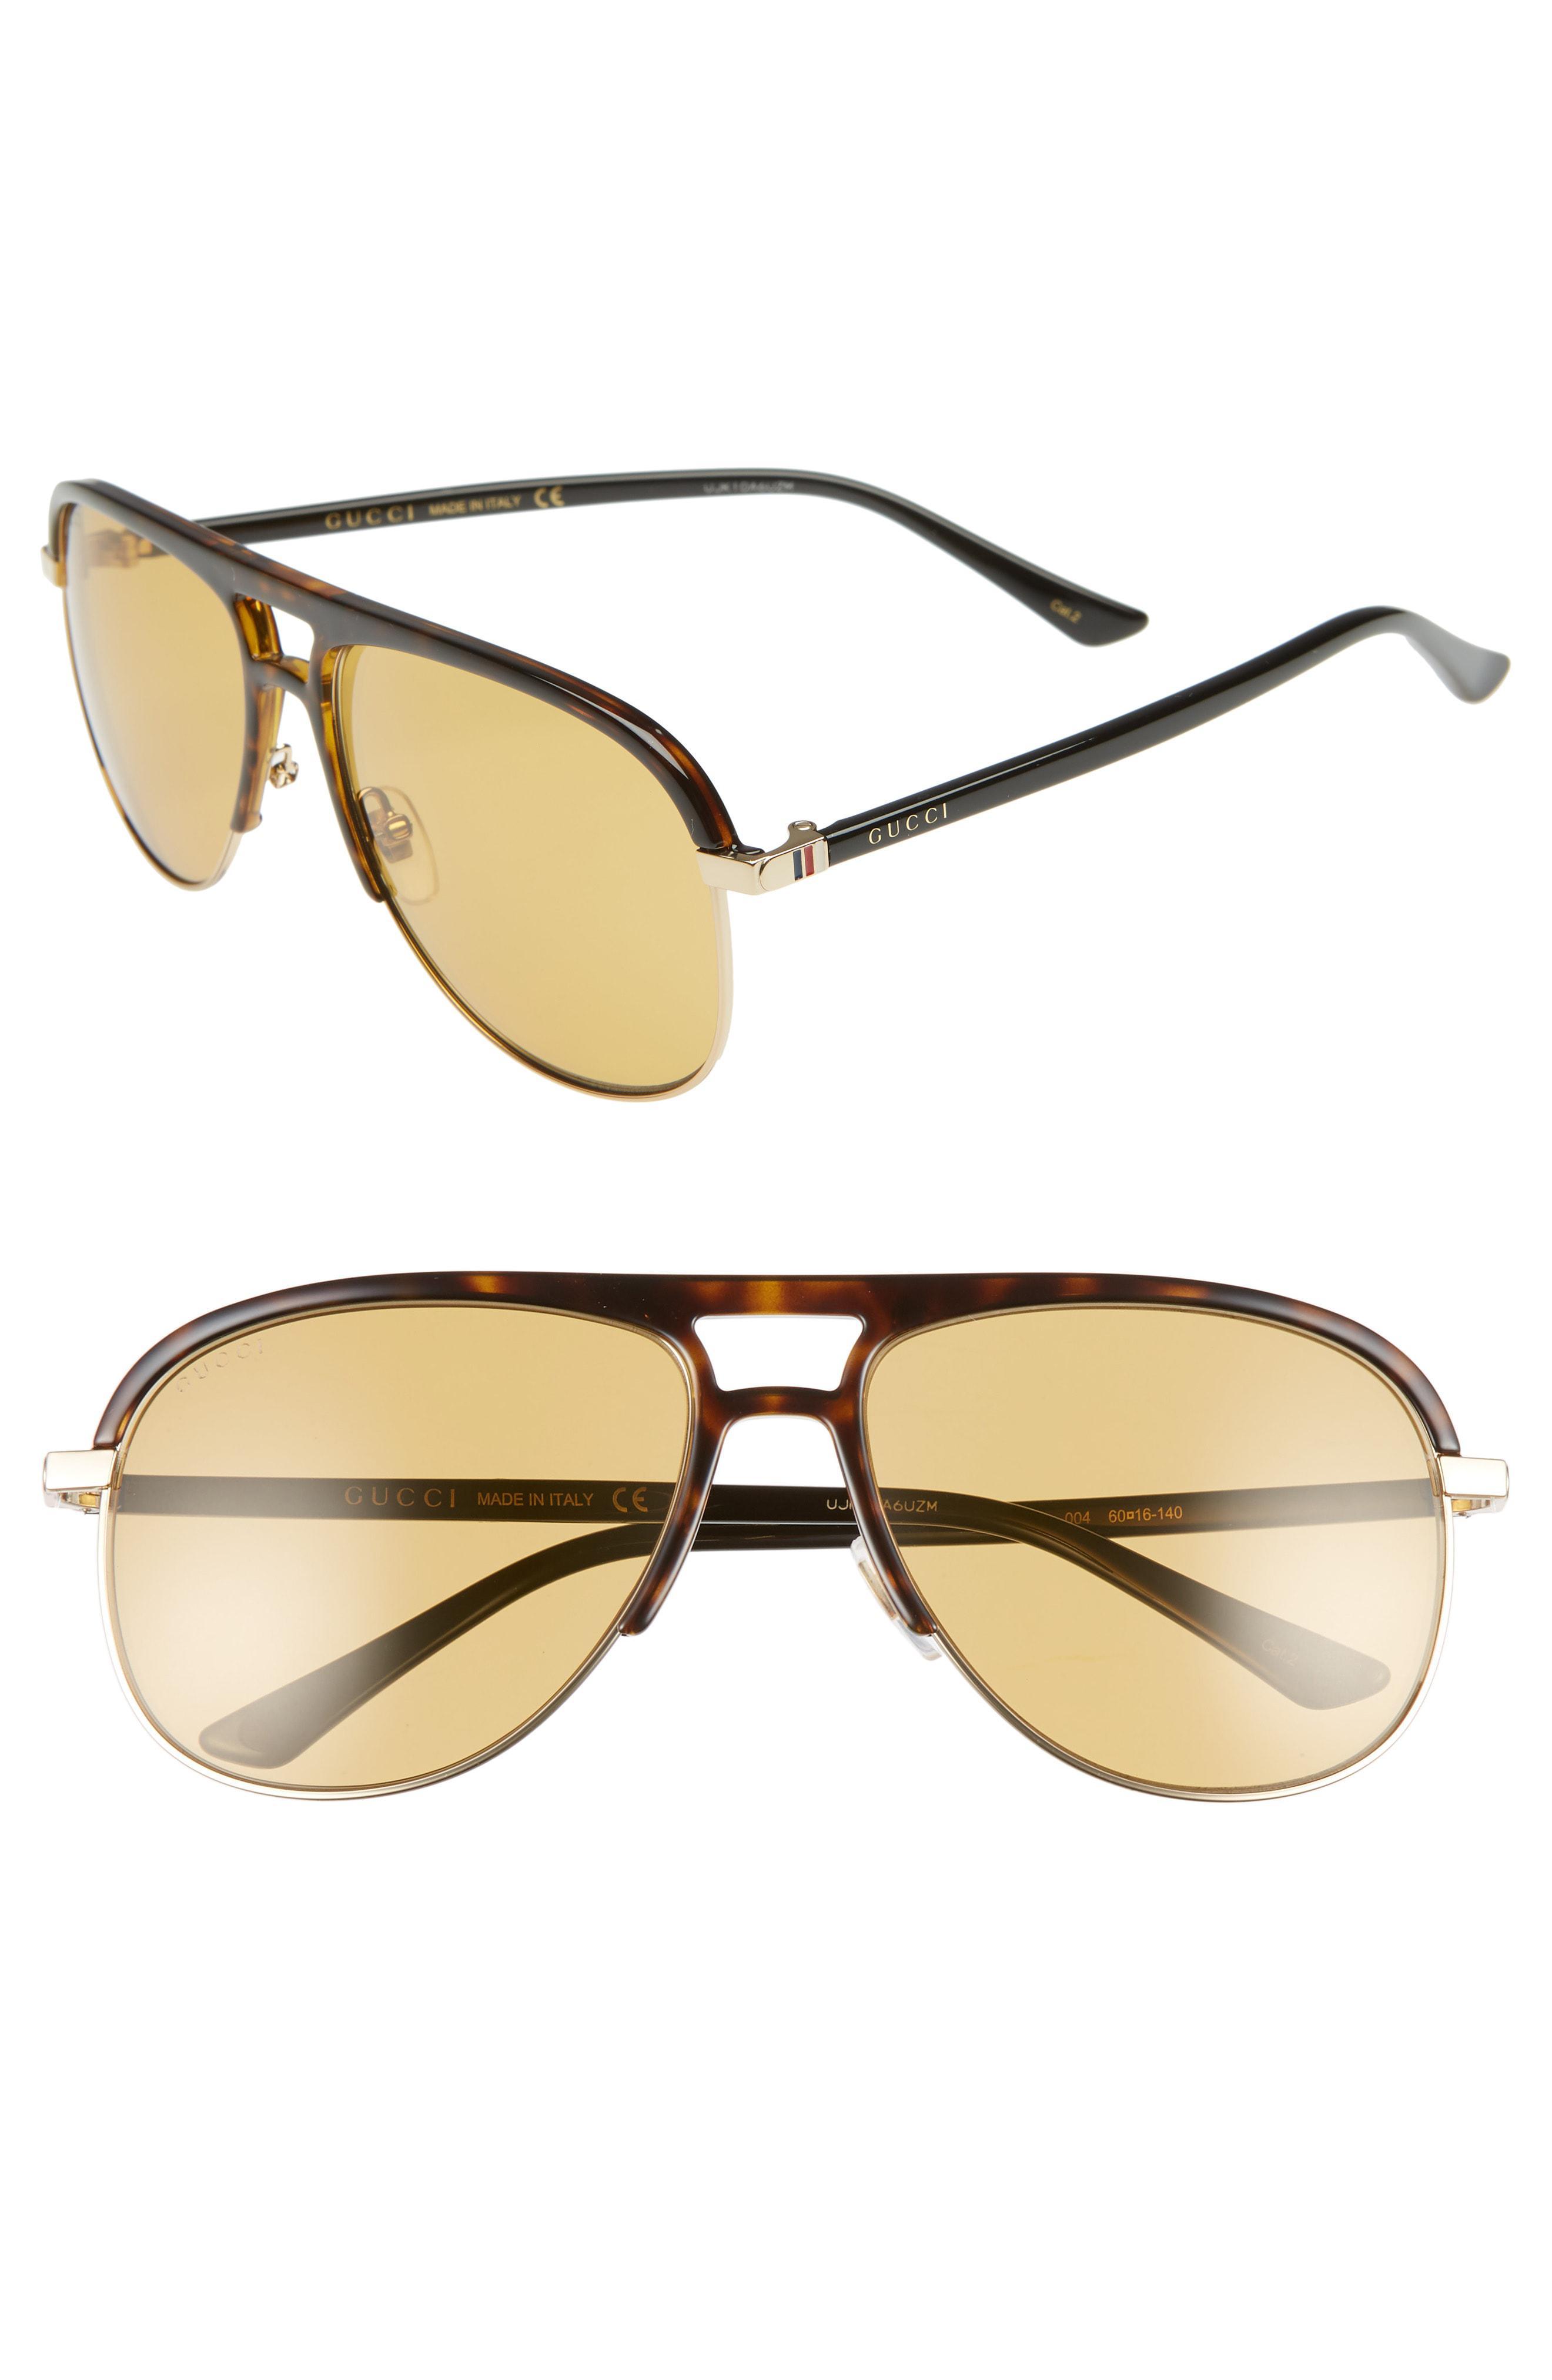 530fb4ea37c Lyst - Gucci 60mm Aviator Sunglasses - in Metallic for Men